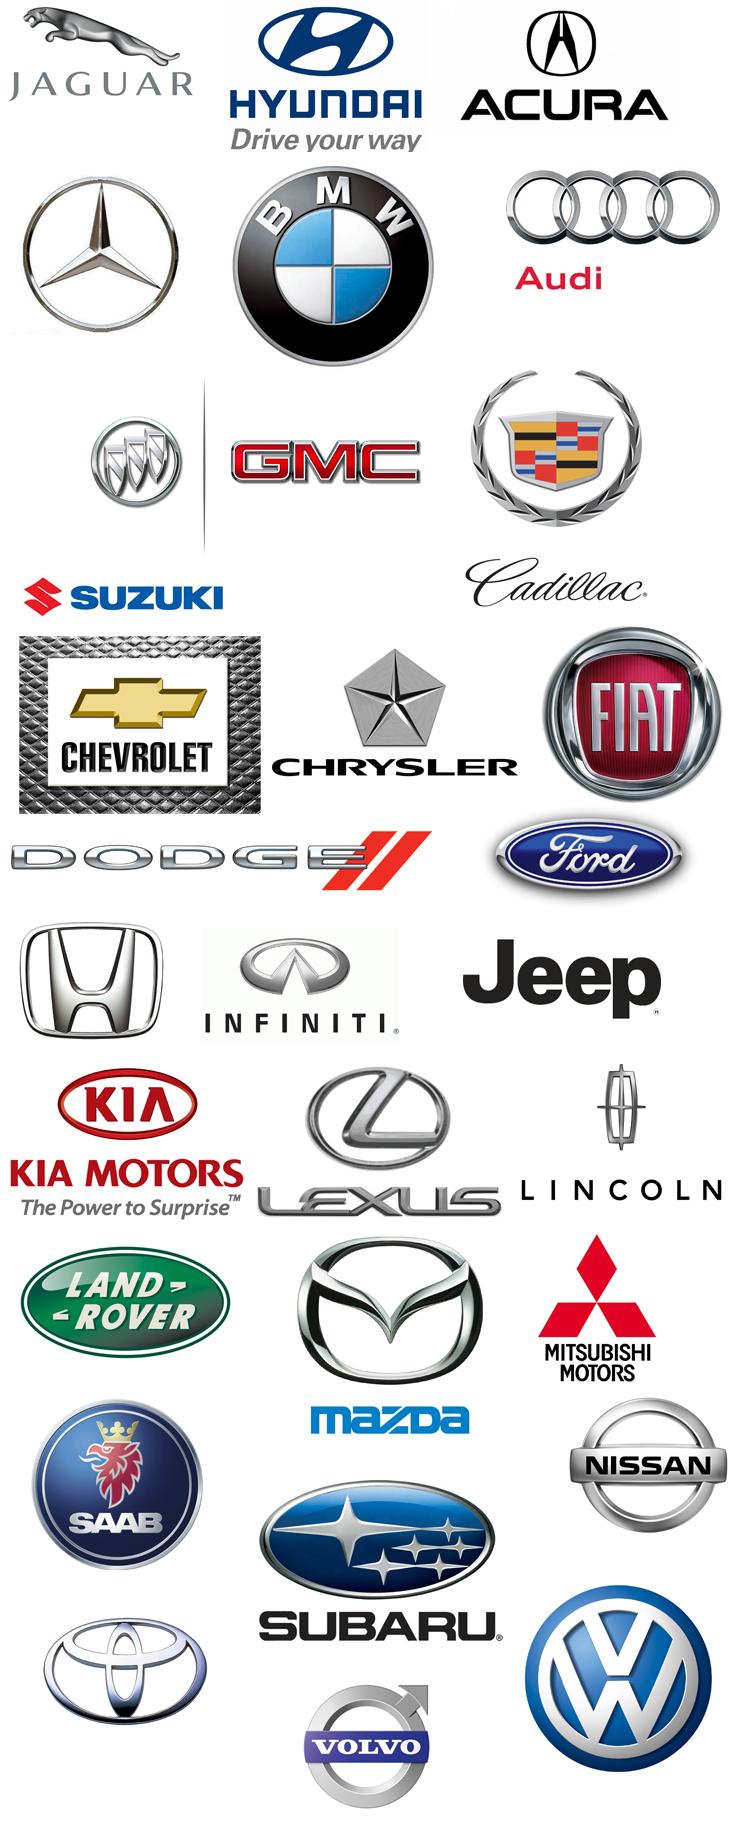 All Car Logos And Names List Id BUZZERG Car Logo And Names - Audi car name list